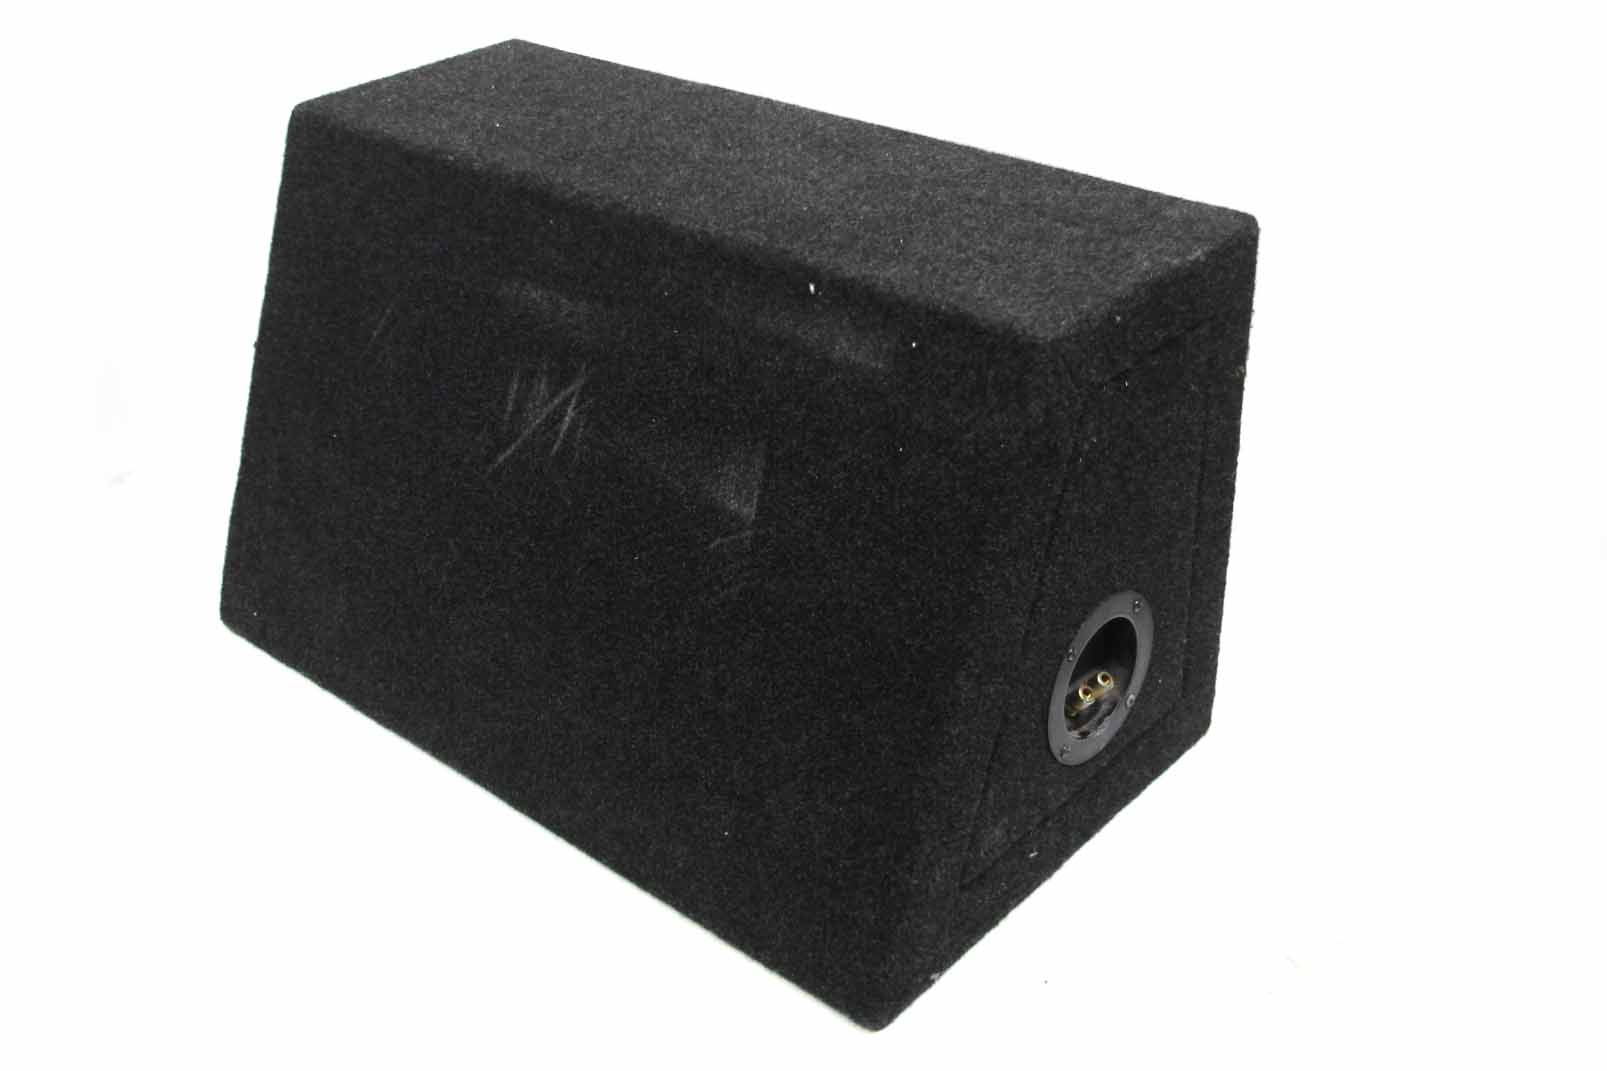 gz radioactive auto subwoofer kfz bass lautsprecher box. Black Bedroom Furniture Sets. Home Design Ideas